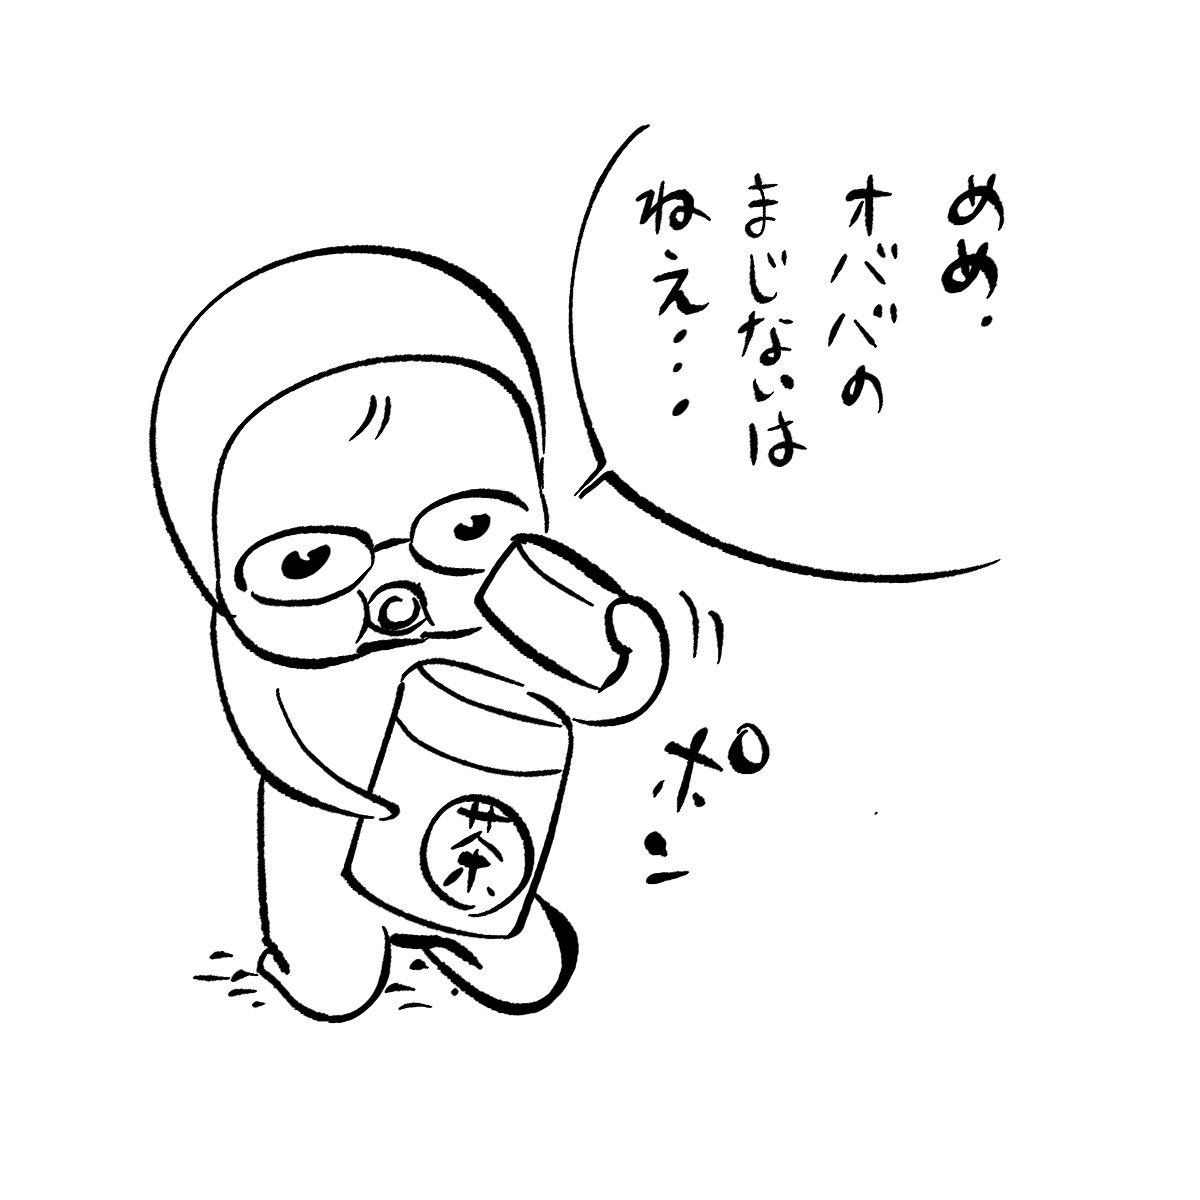 Twoucan - 森山一保 (@ipposan1)